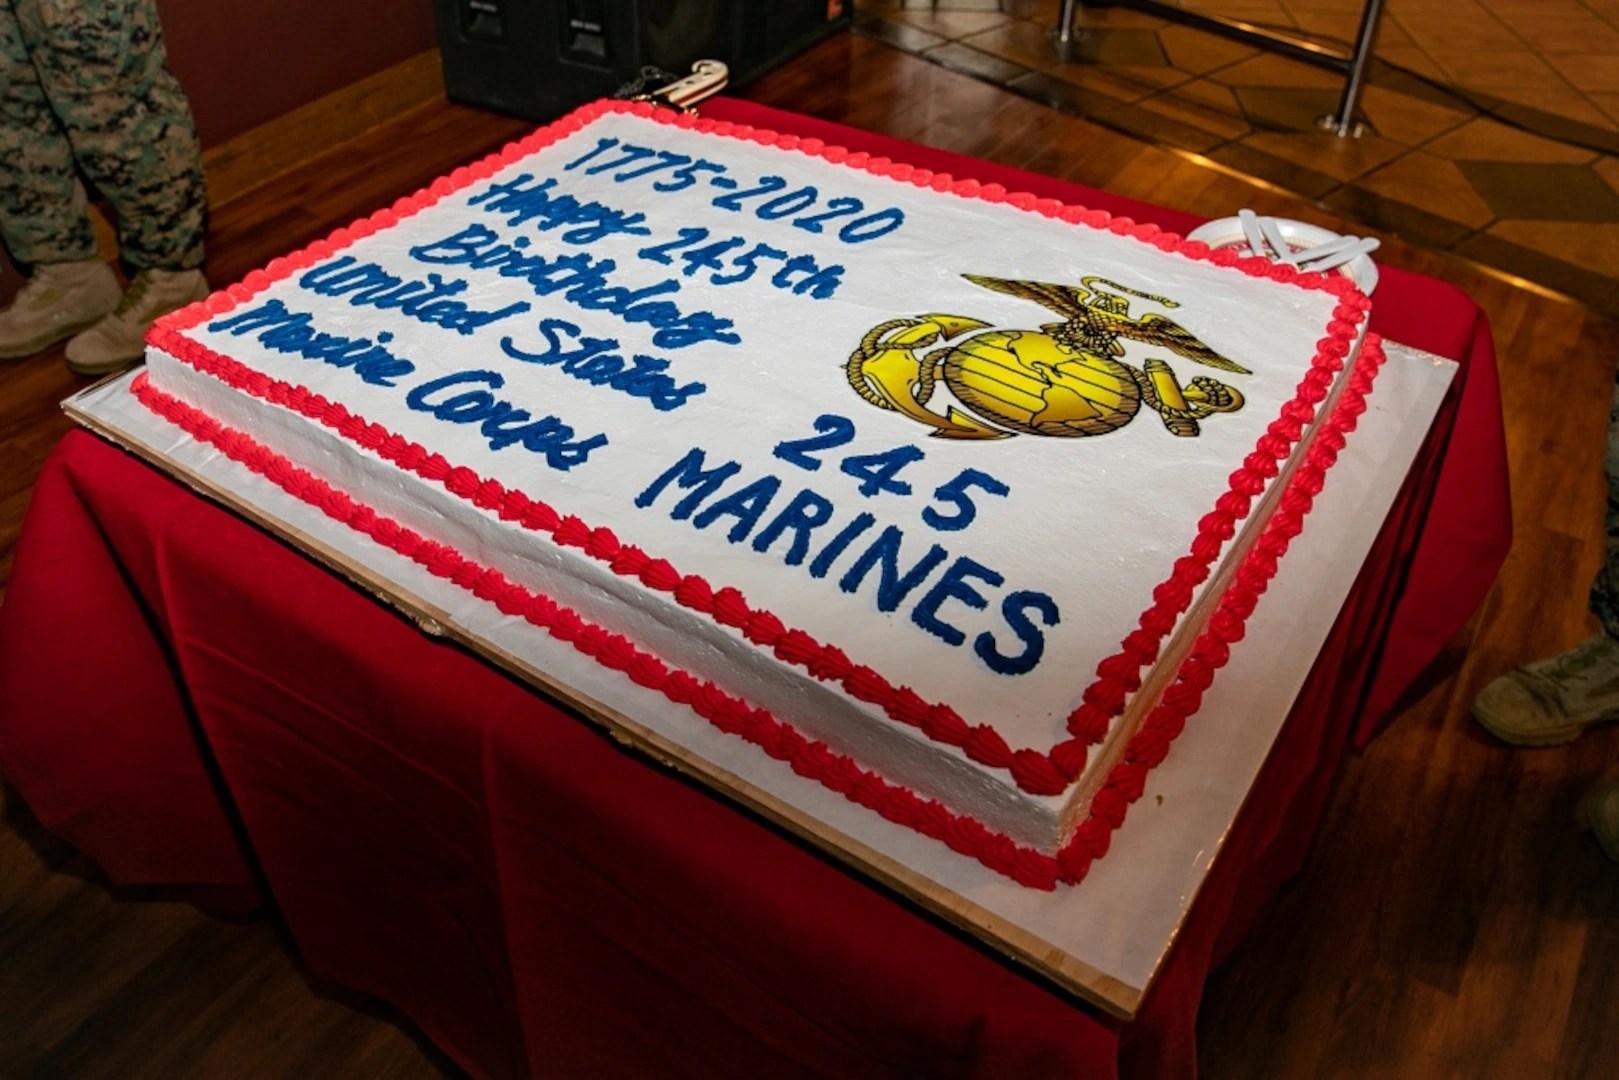 3rd Marine Expeditionary Brigade Commemorates Marine Corps Birthday With Cake Cutting Ceremony Washington Headquarters Services News Display